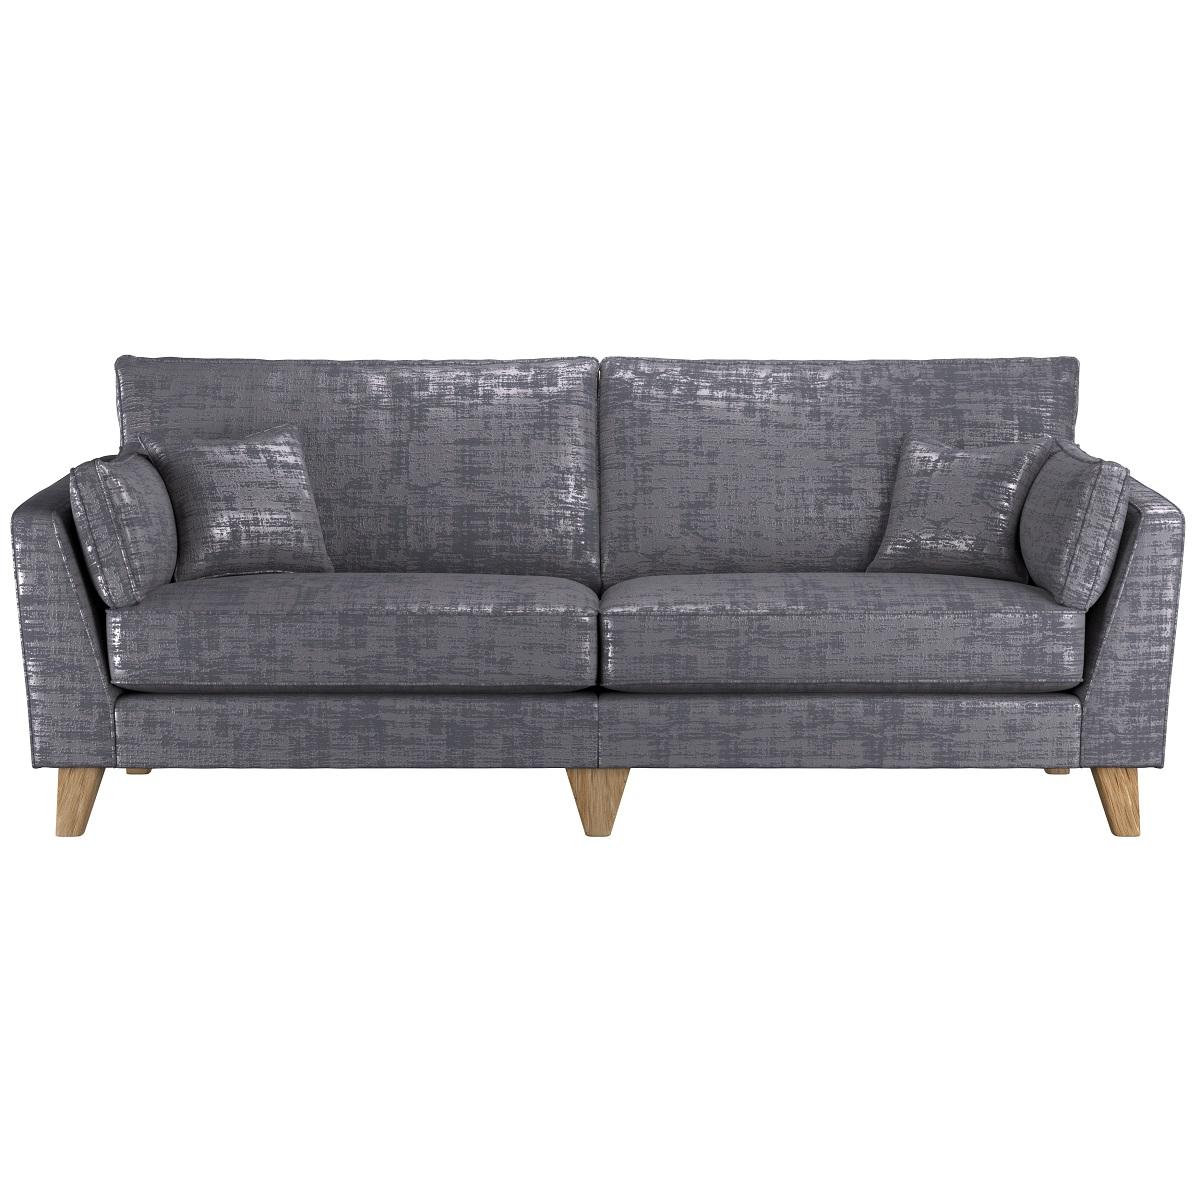 Quincy 4 Seater Sofa Split